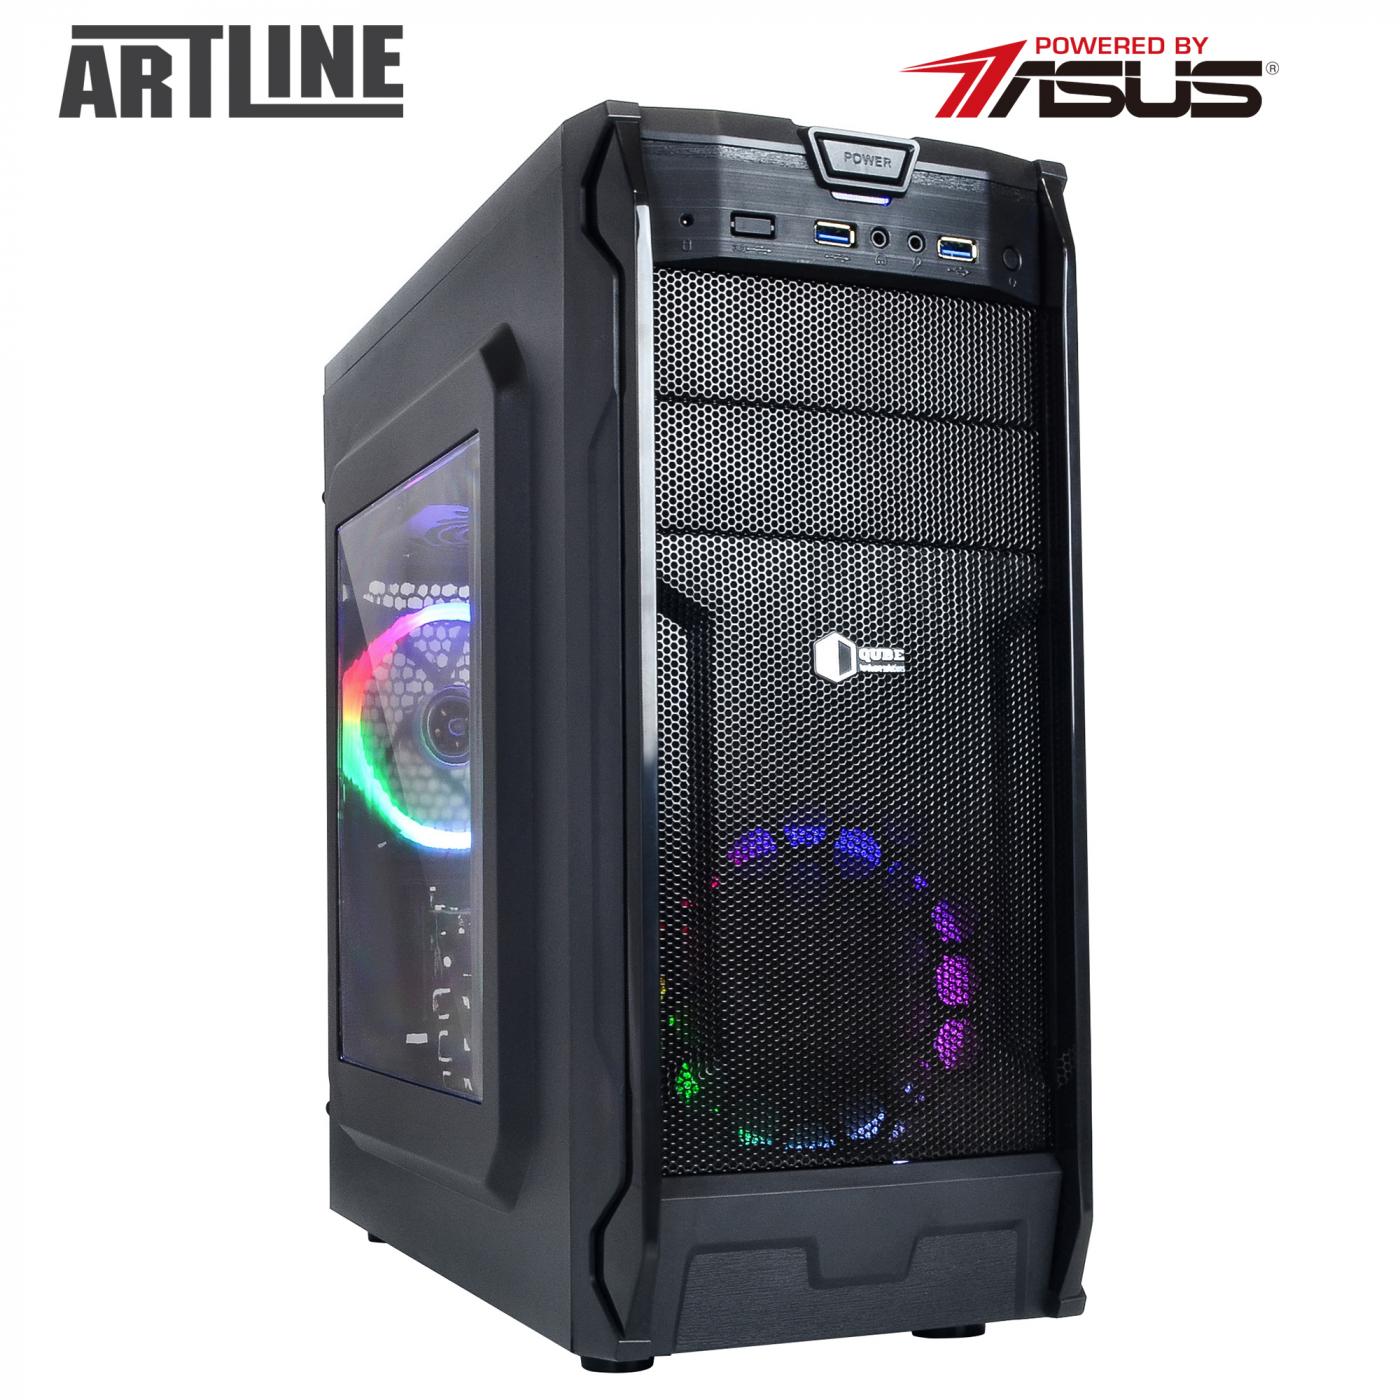 ARTLINE Gaming X35v15